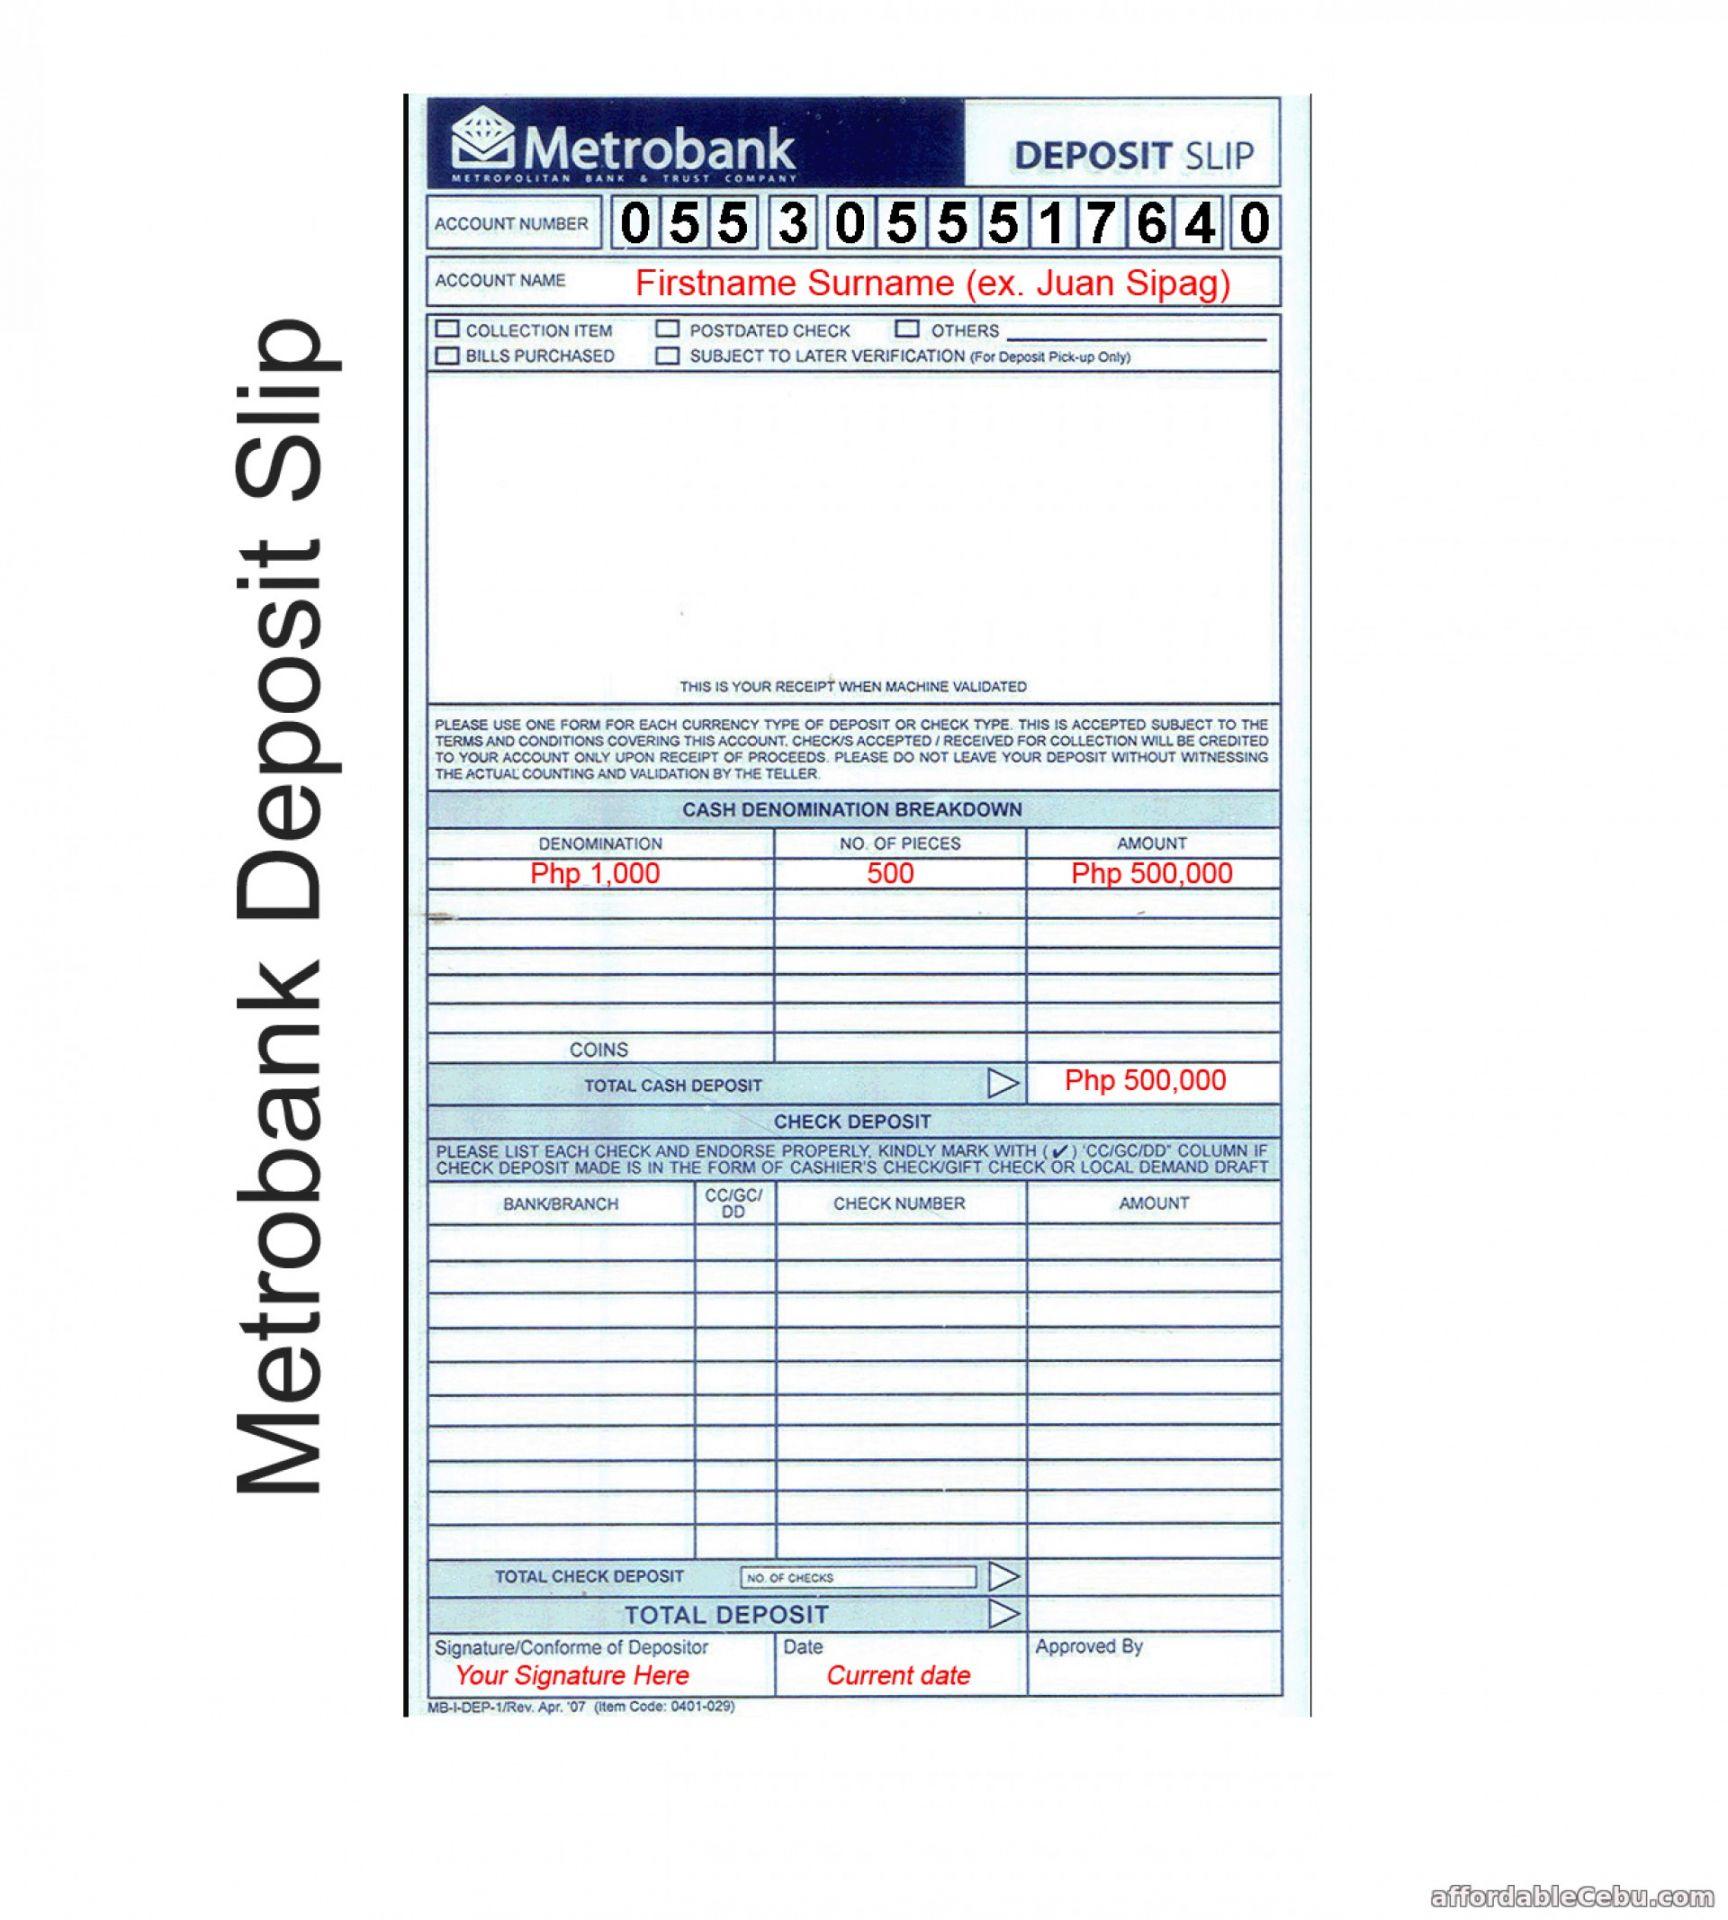 Get Our Image Of Checking Deposit Slip Template For Free Deposit Templates Slip